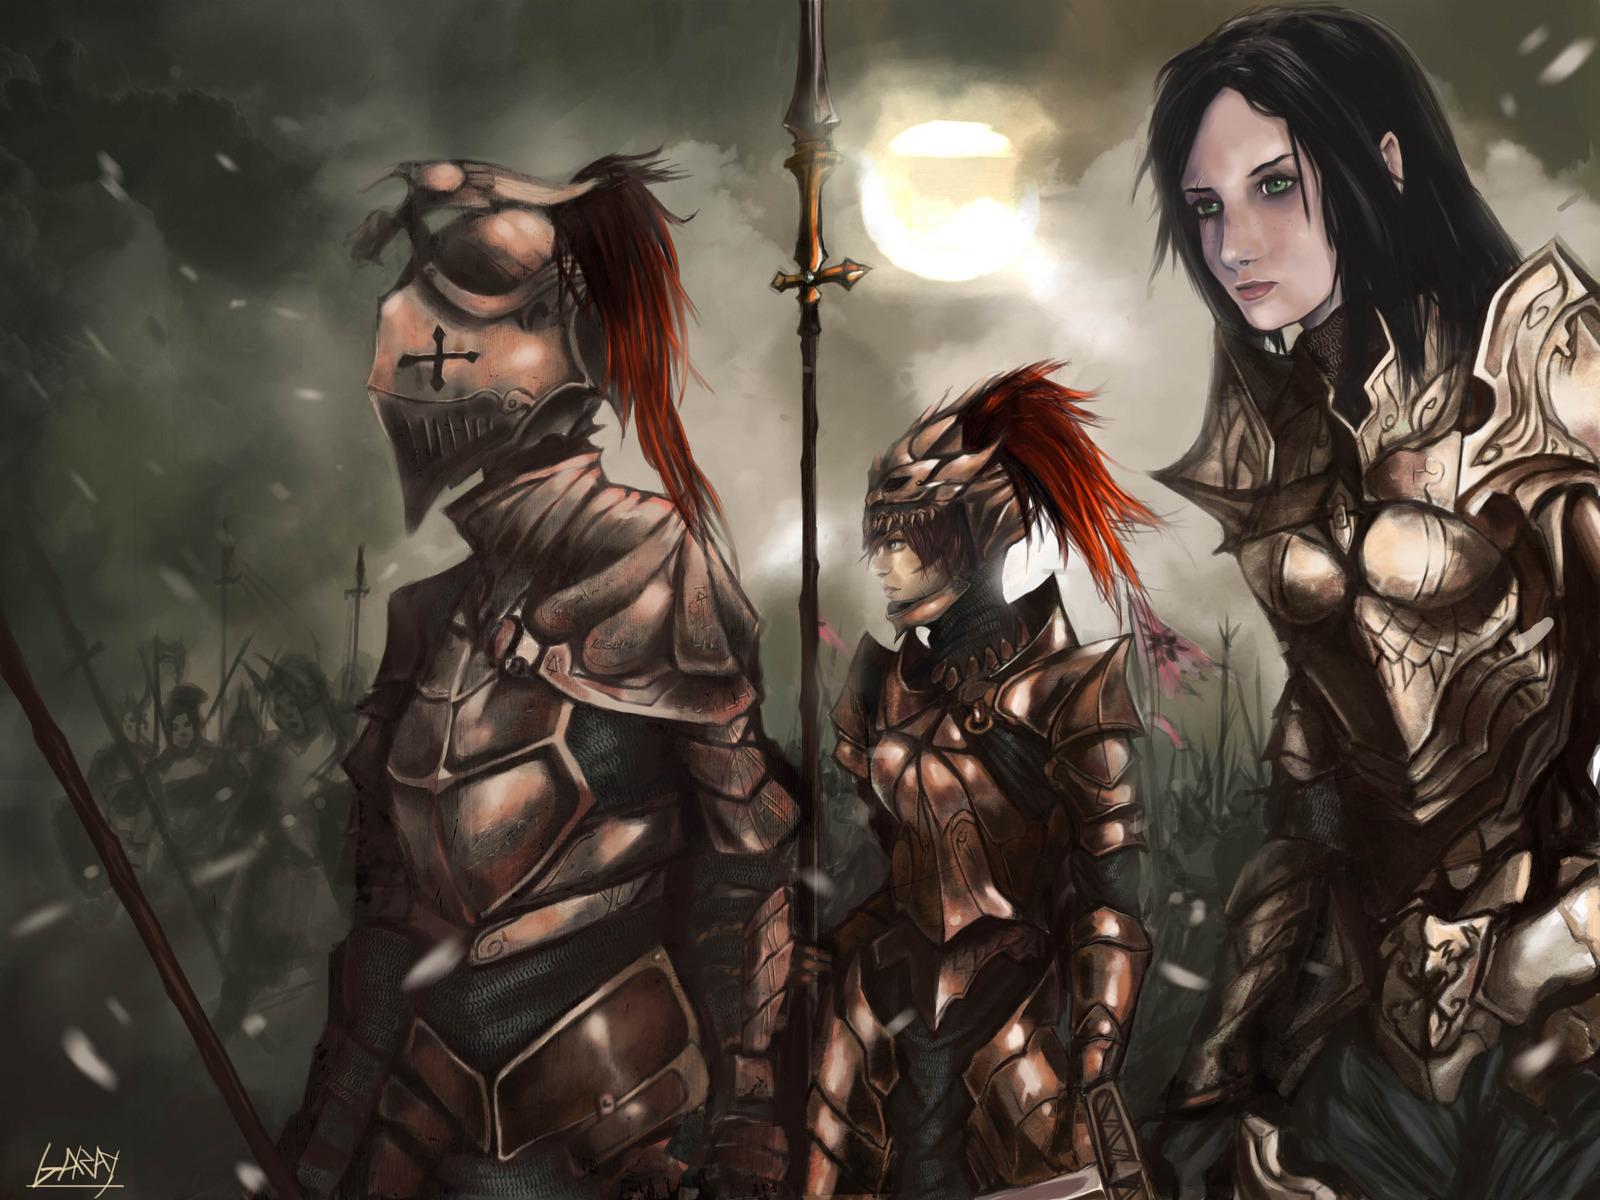 dark souls 2 how to kill white guys in dragons